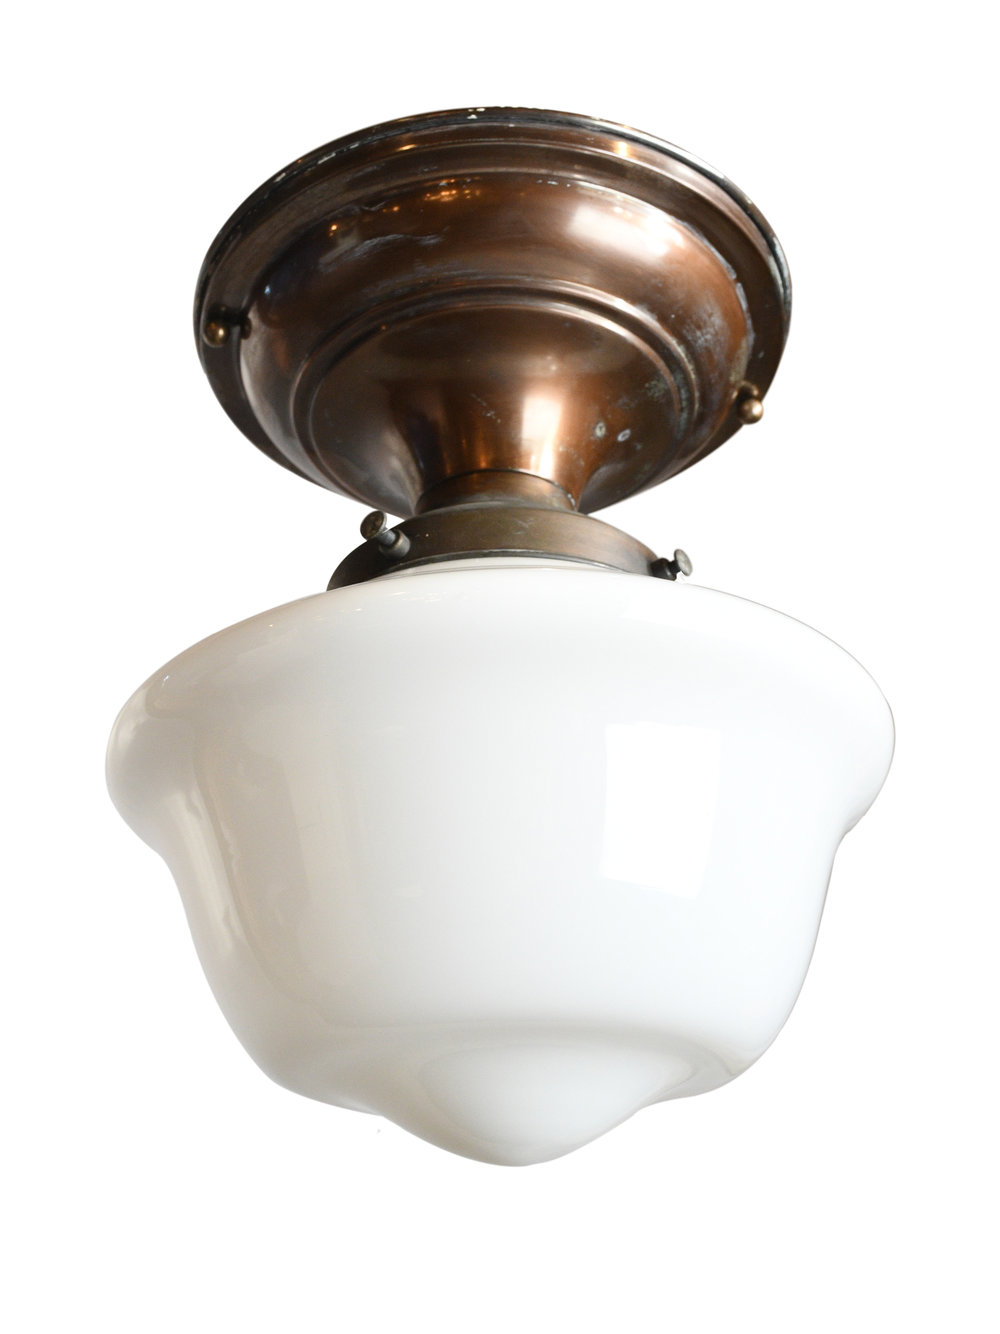 47642-schoolhouse-lights-xs-flushmount-5.jpg